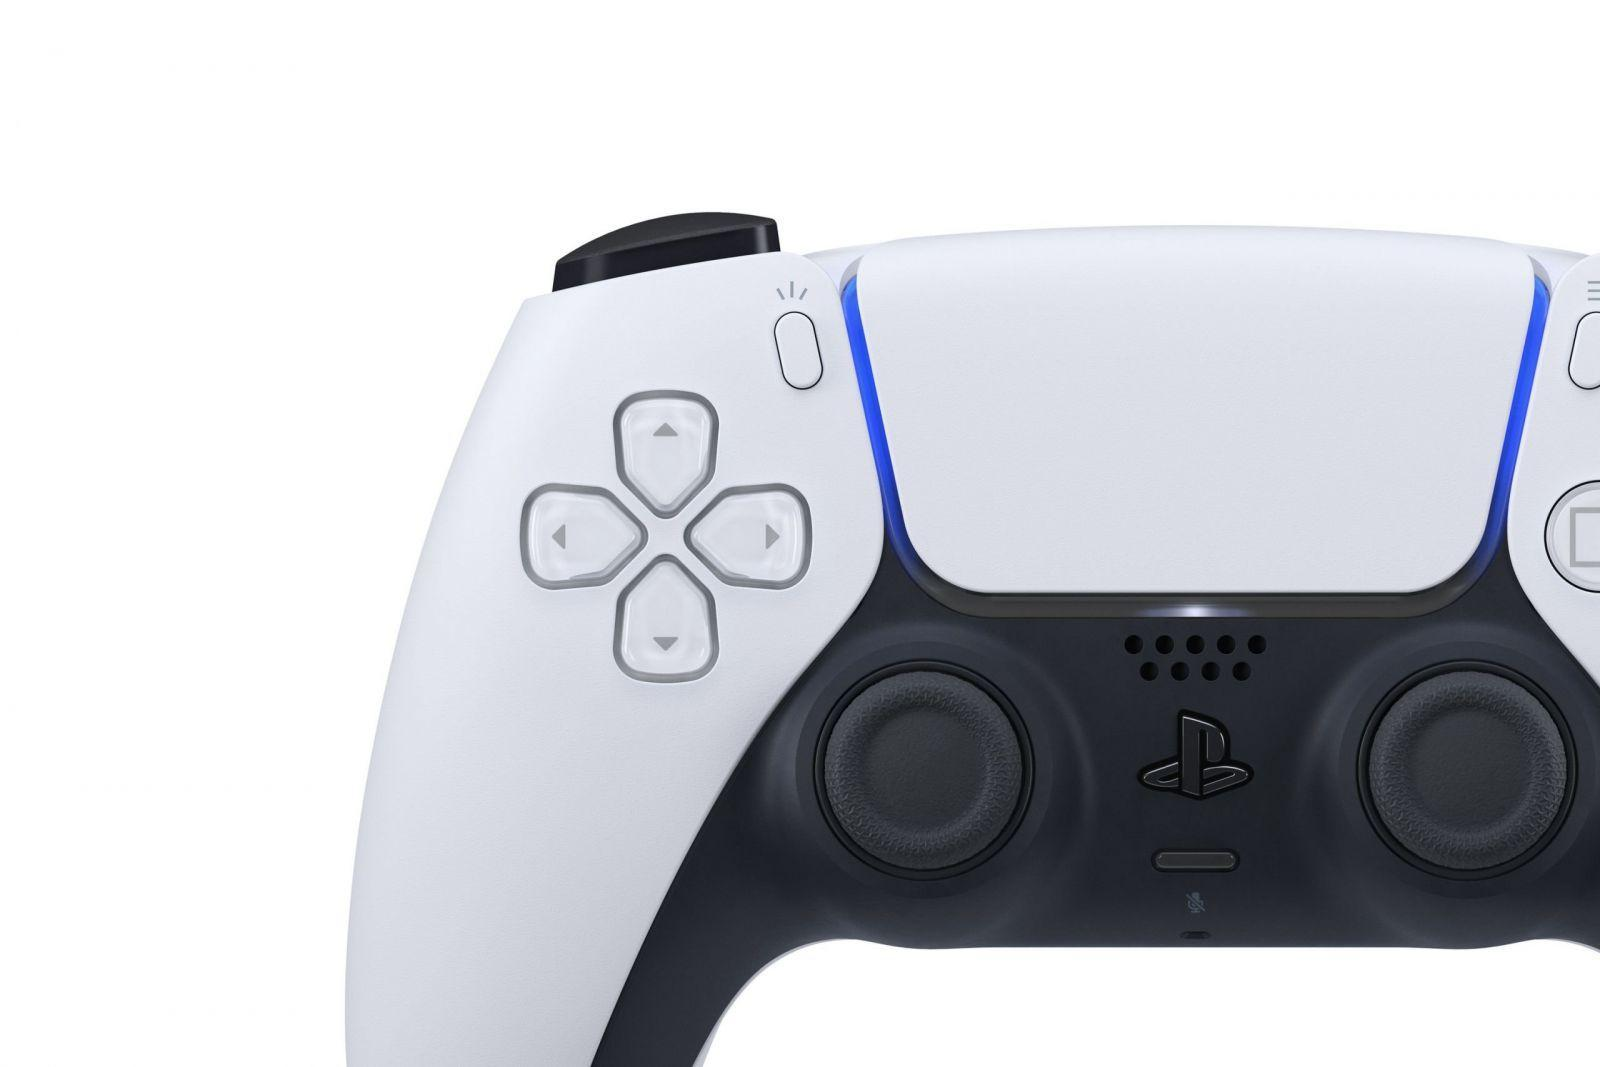 Sony представила джойстик DualSense для Playstation 5 Sony представила джойстик DualSense для Playstation 5